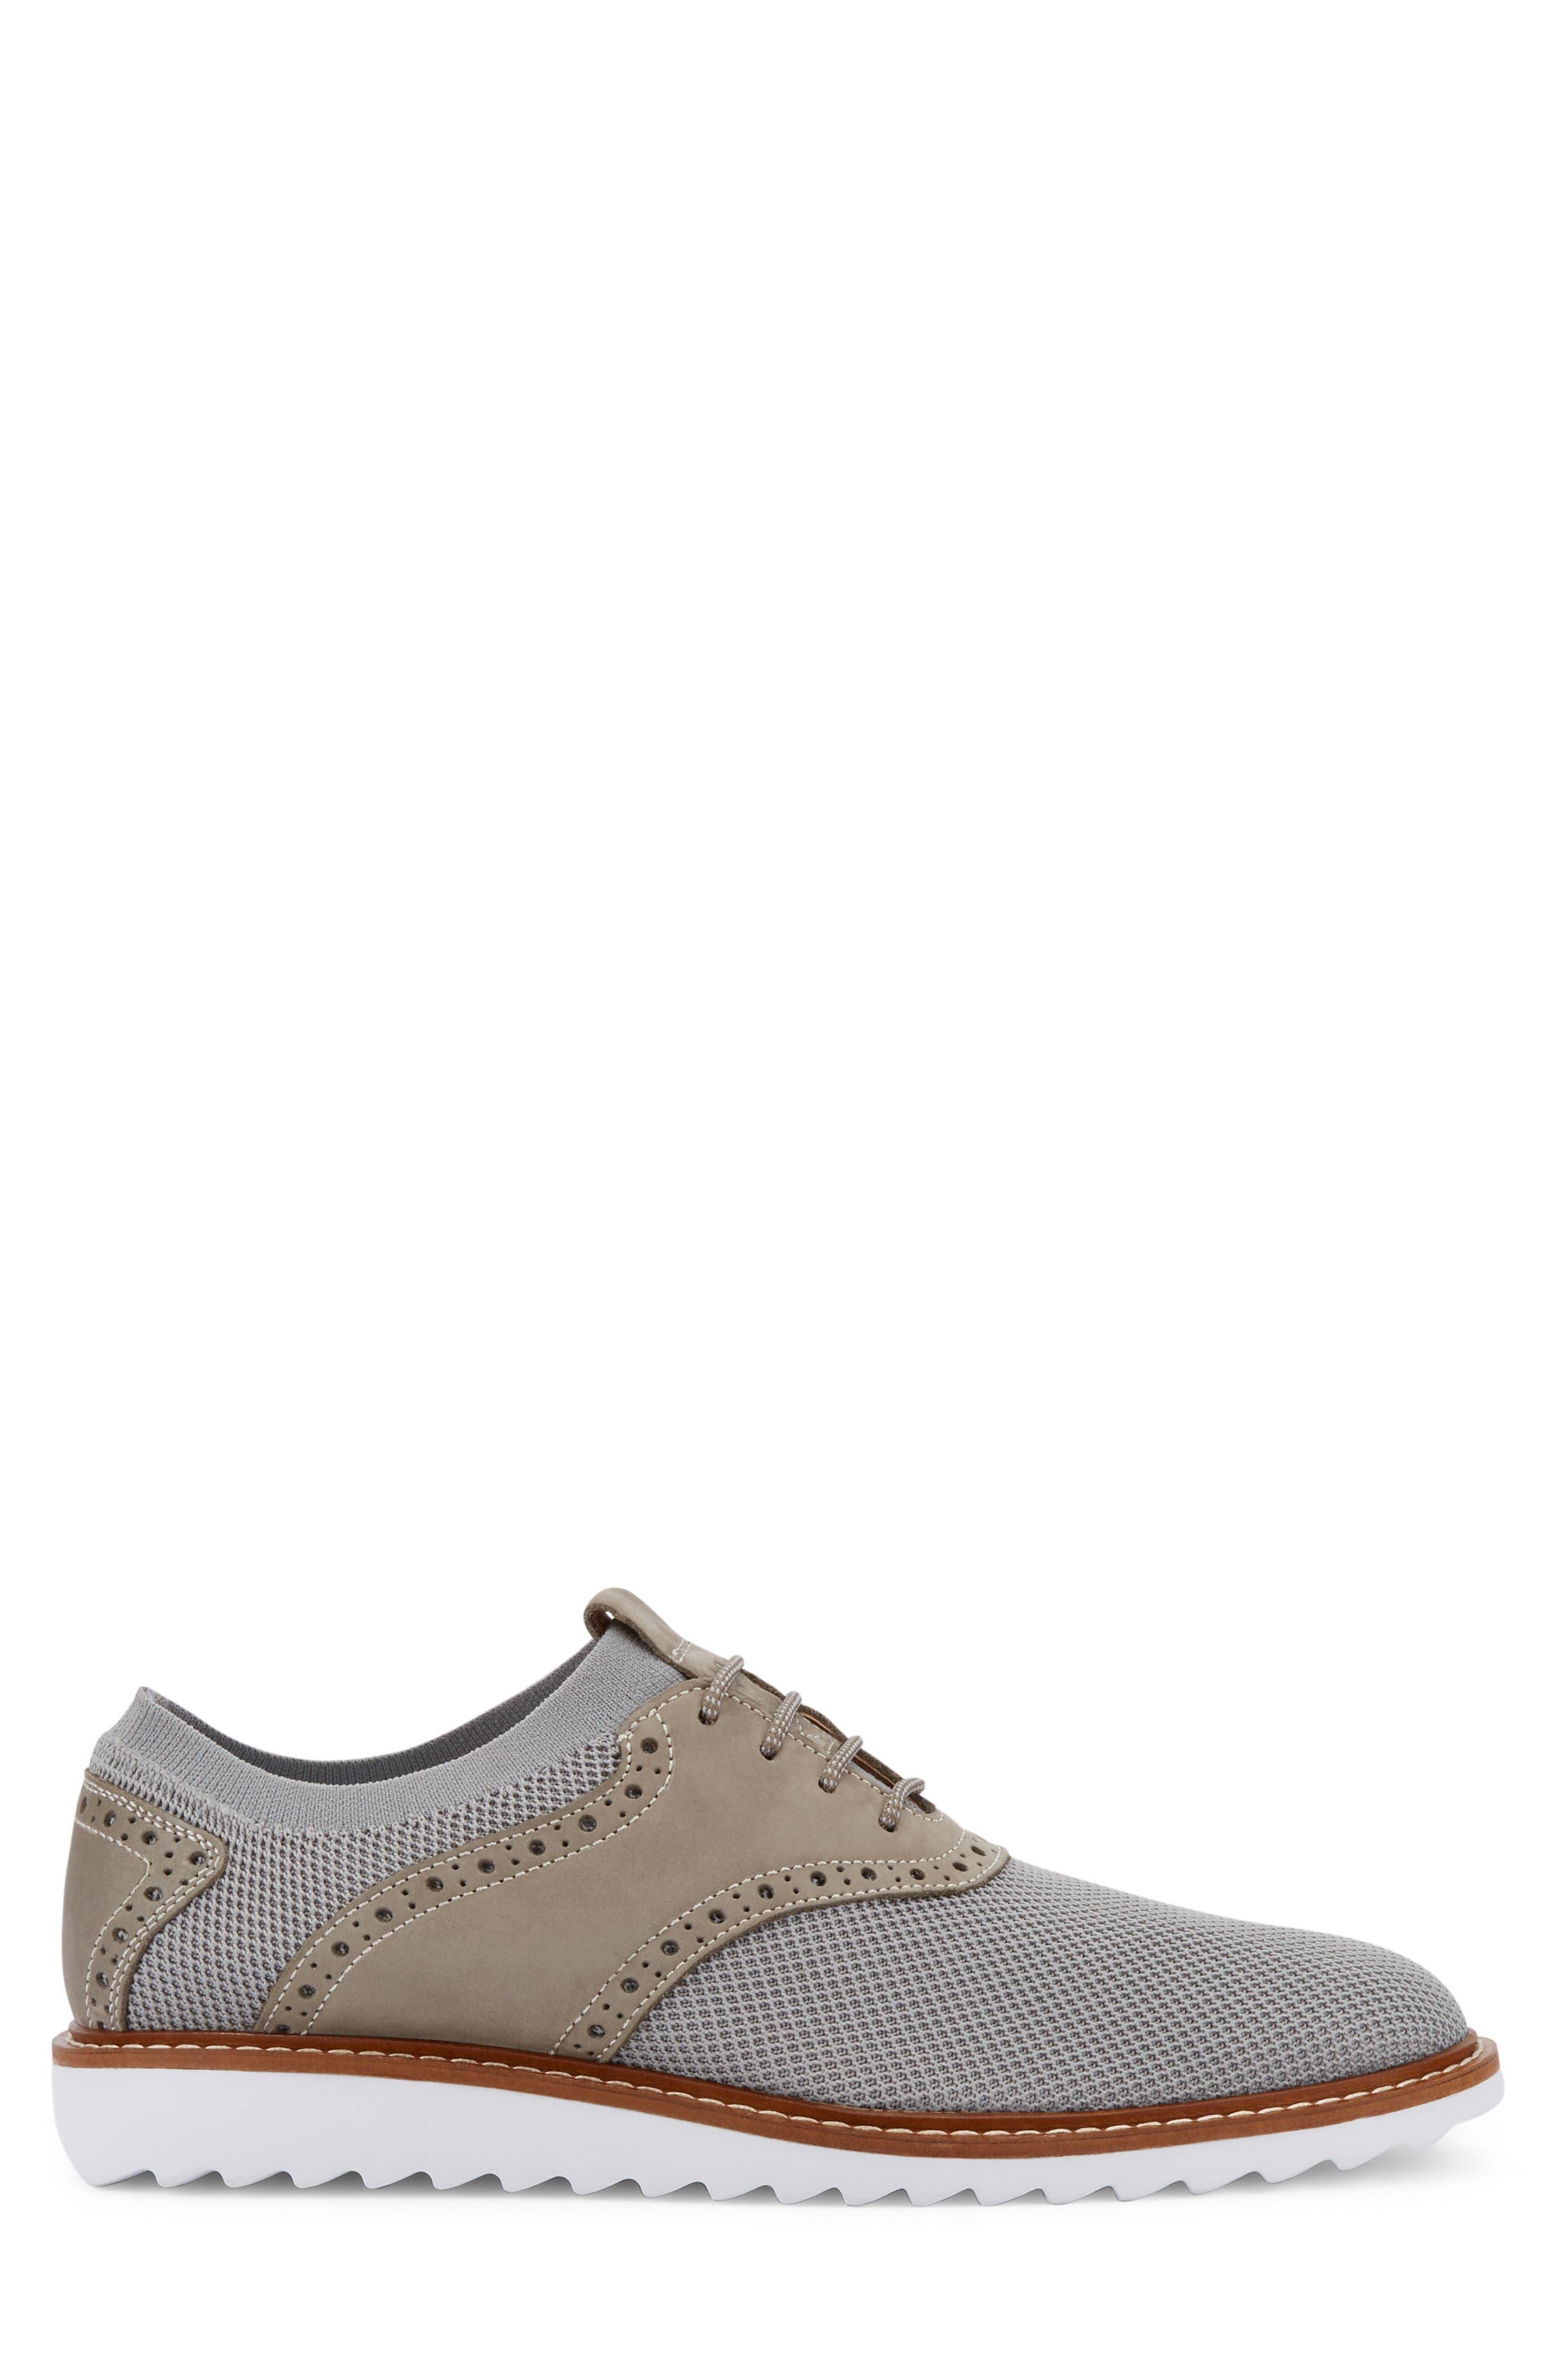 Buck 2.0 Saddle Shoe,                             Alternate thumbnail 3, color,                             Light Grey Knit/ Nubuck